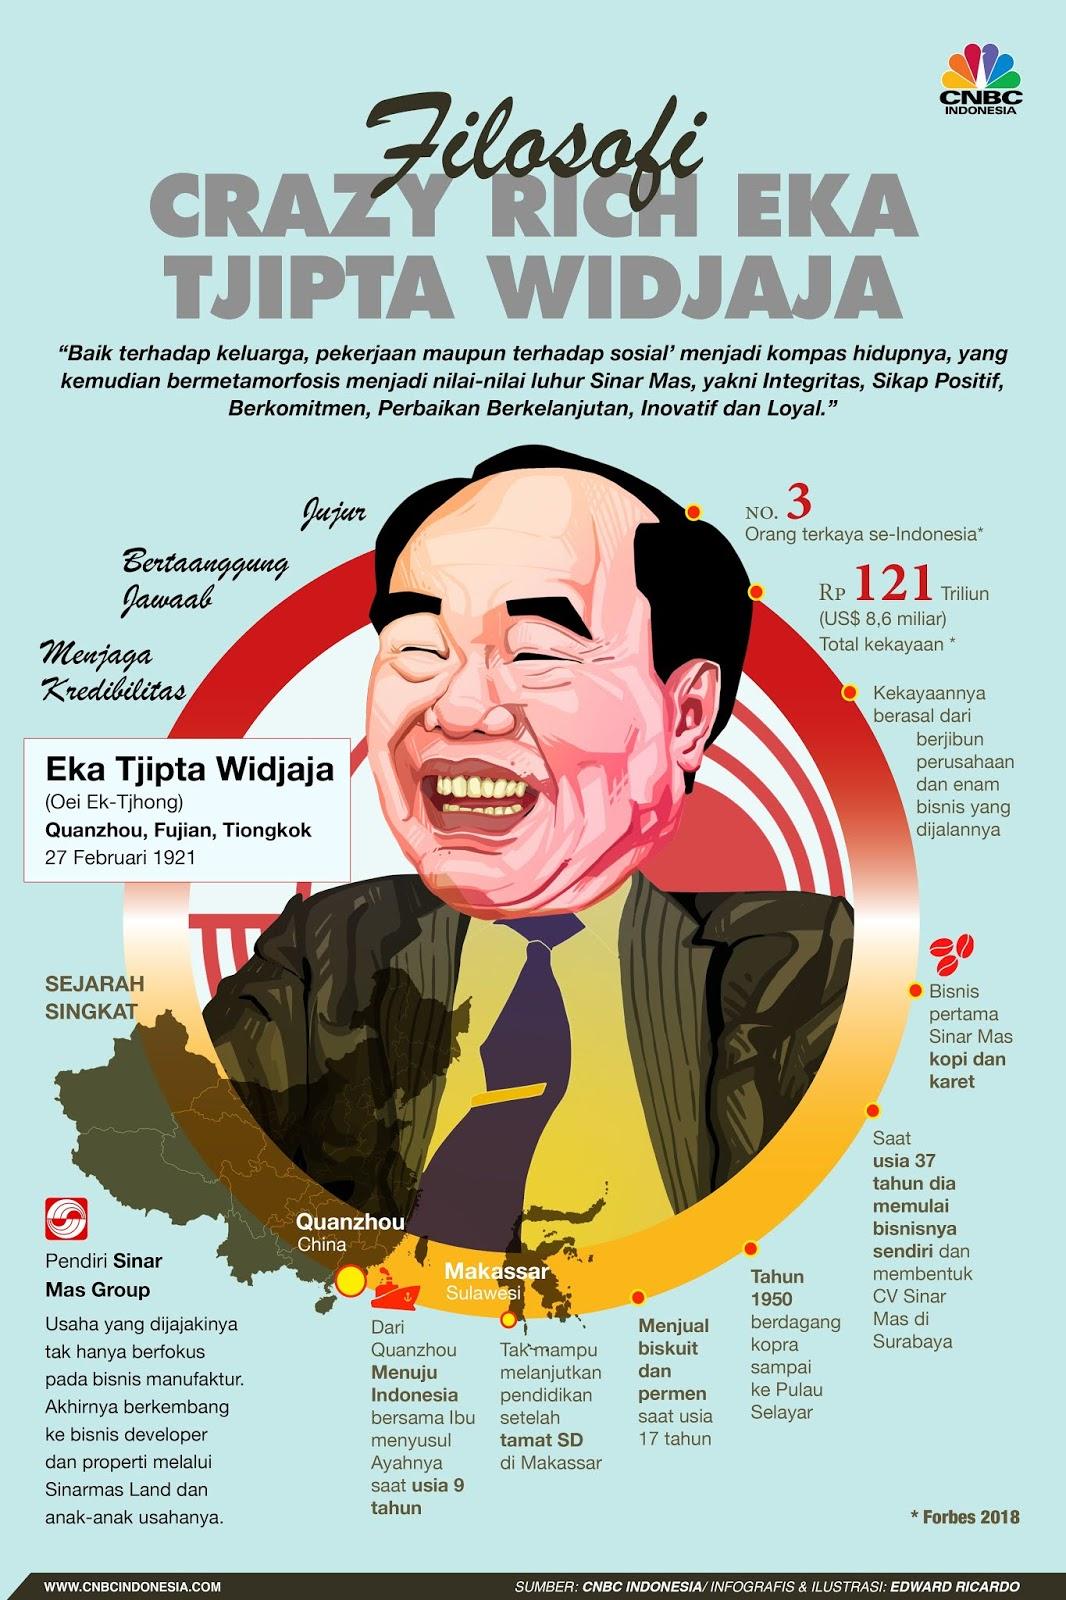 Biografi Eka Tjipta Widjaja pendiri Sinarmas Group